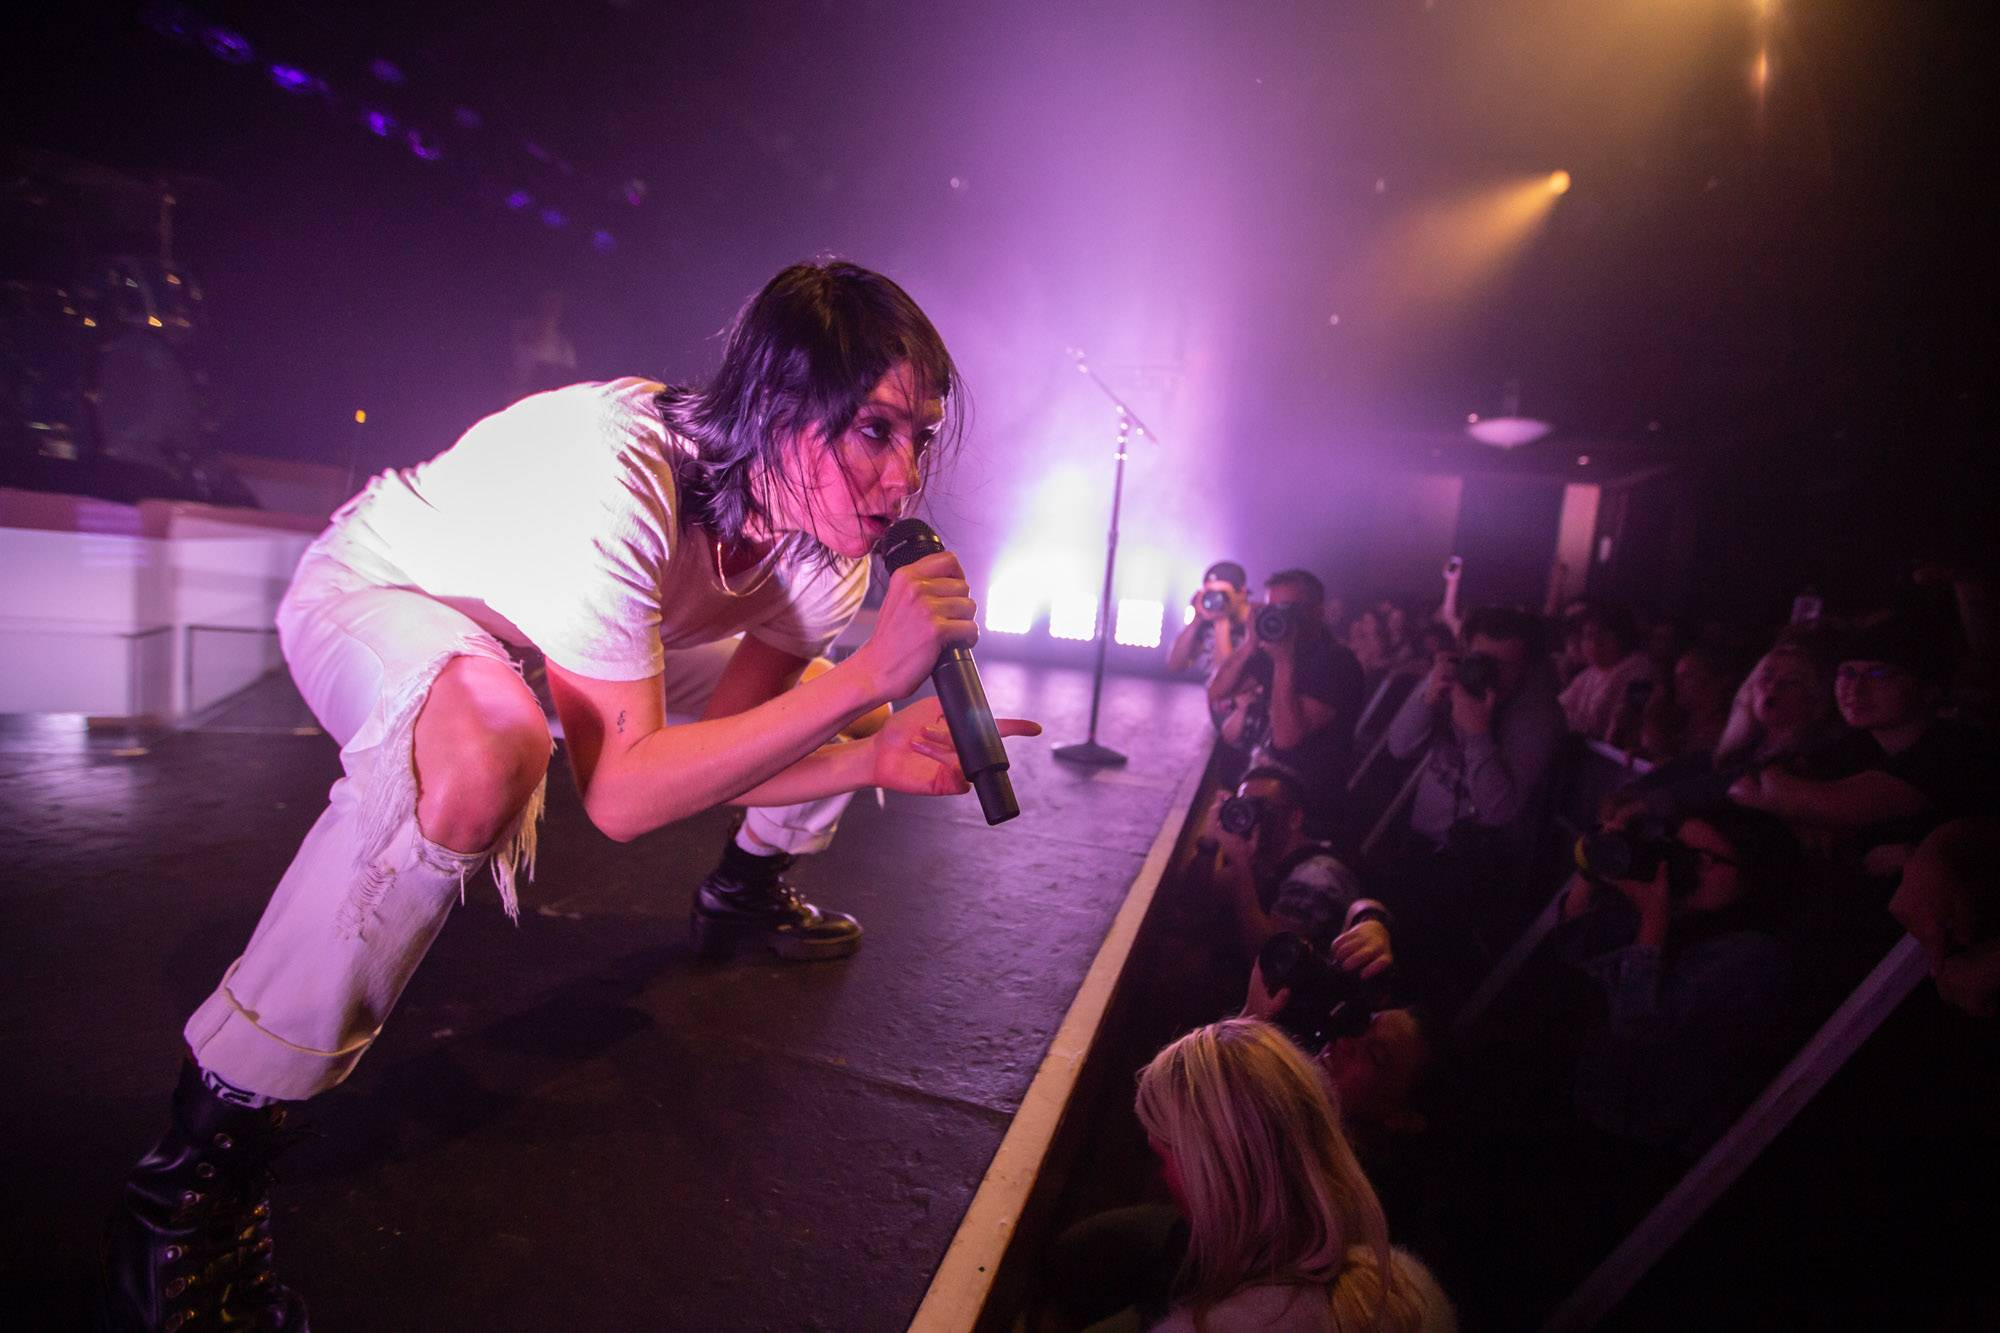 K. Flay at the Commodore Ballroom, Vancouver, Sep 9 2019. Kirk Chantraine photo.